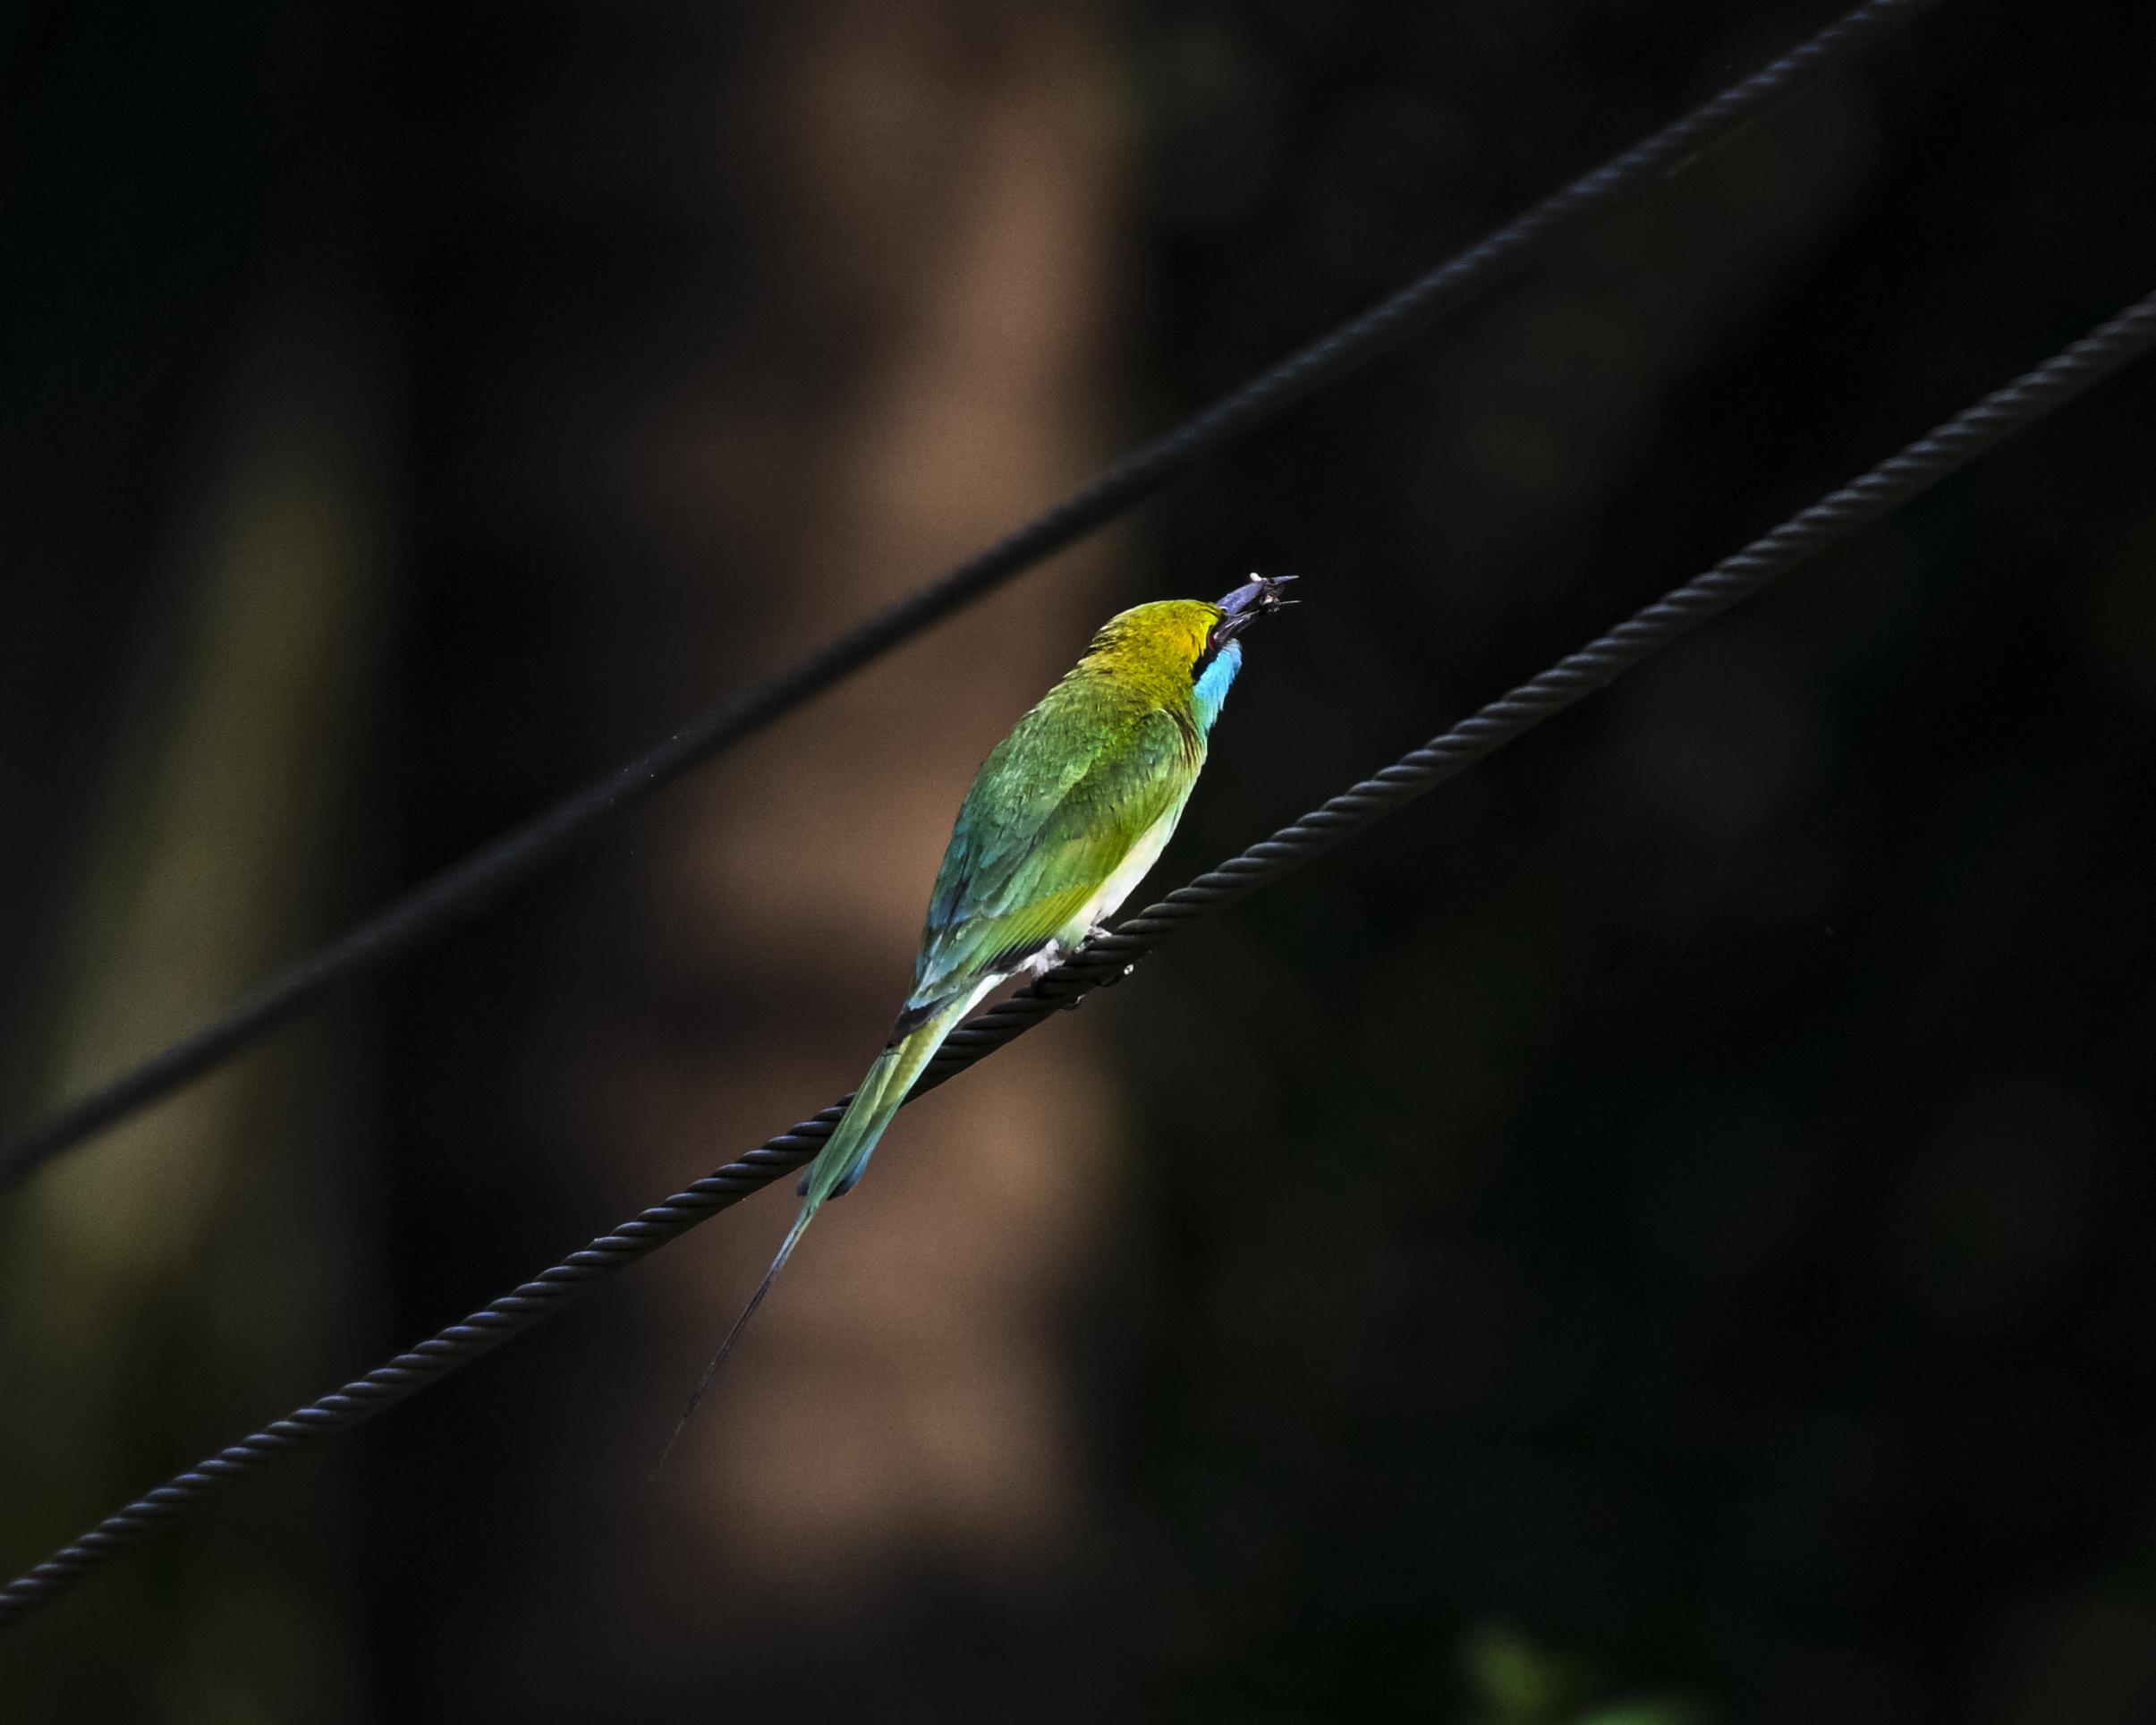 bird on a rope